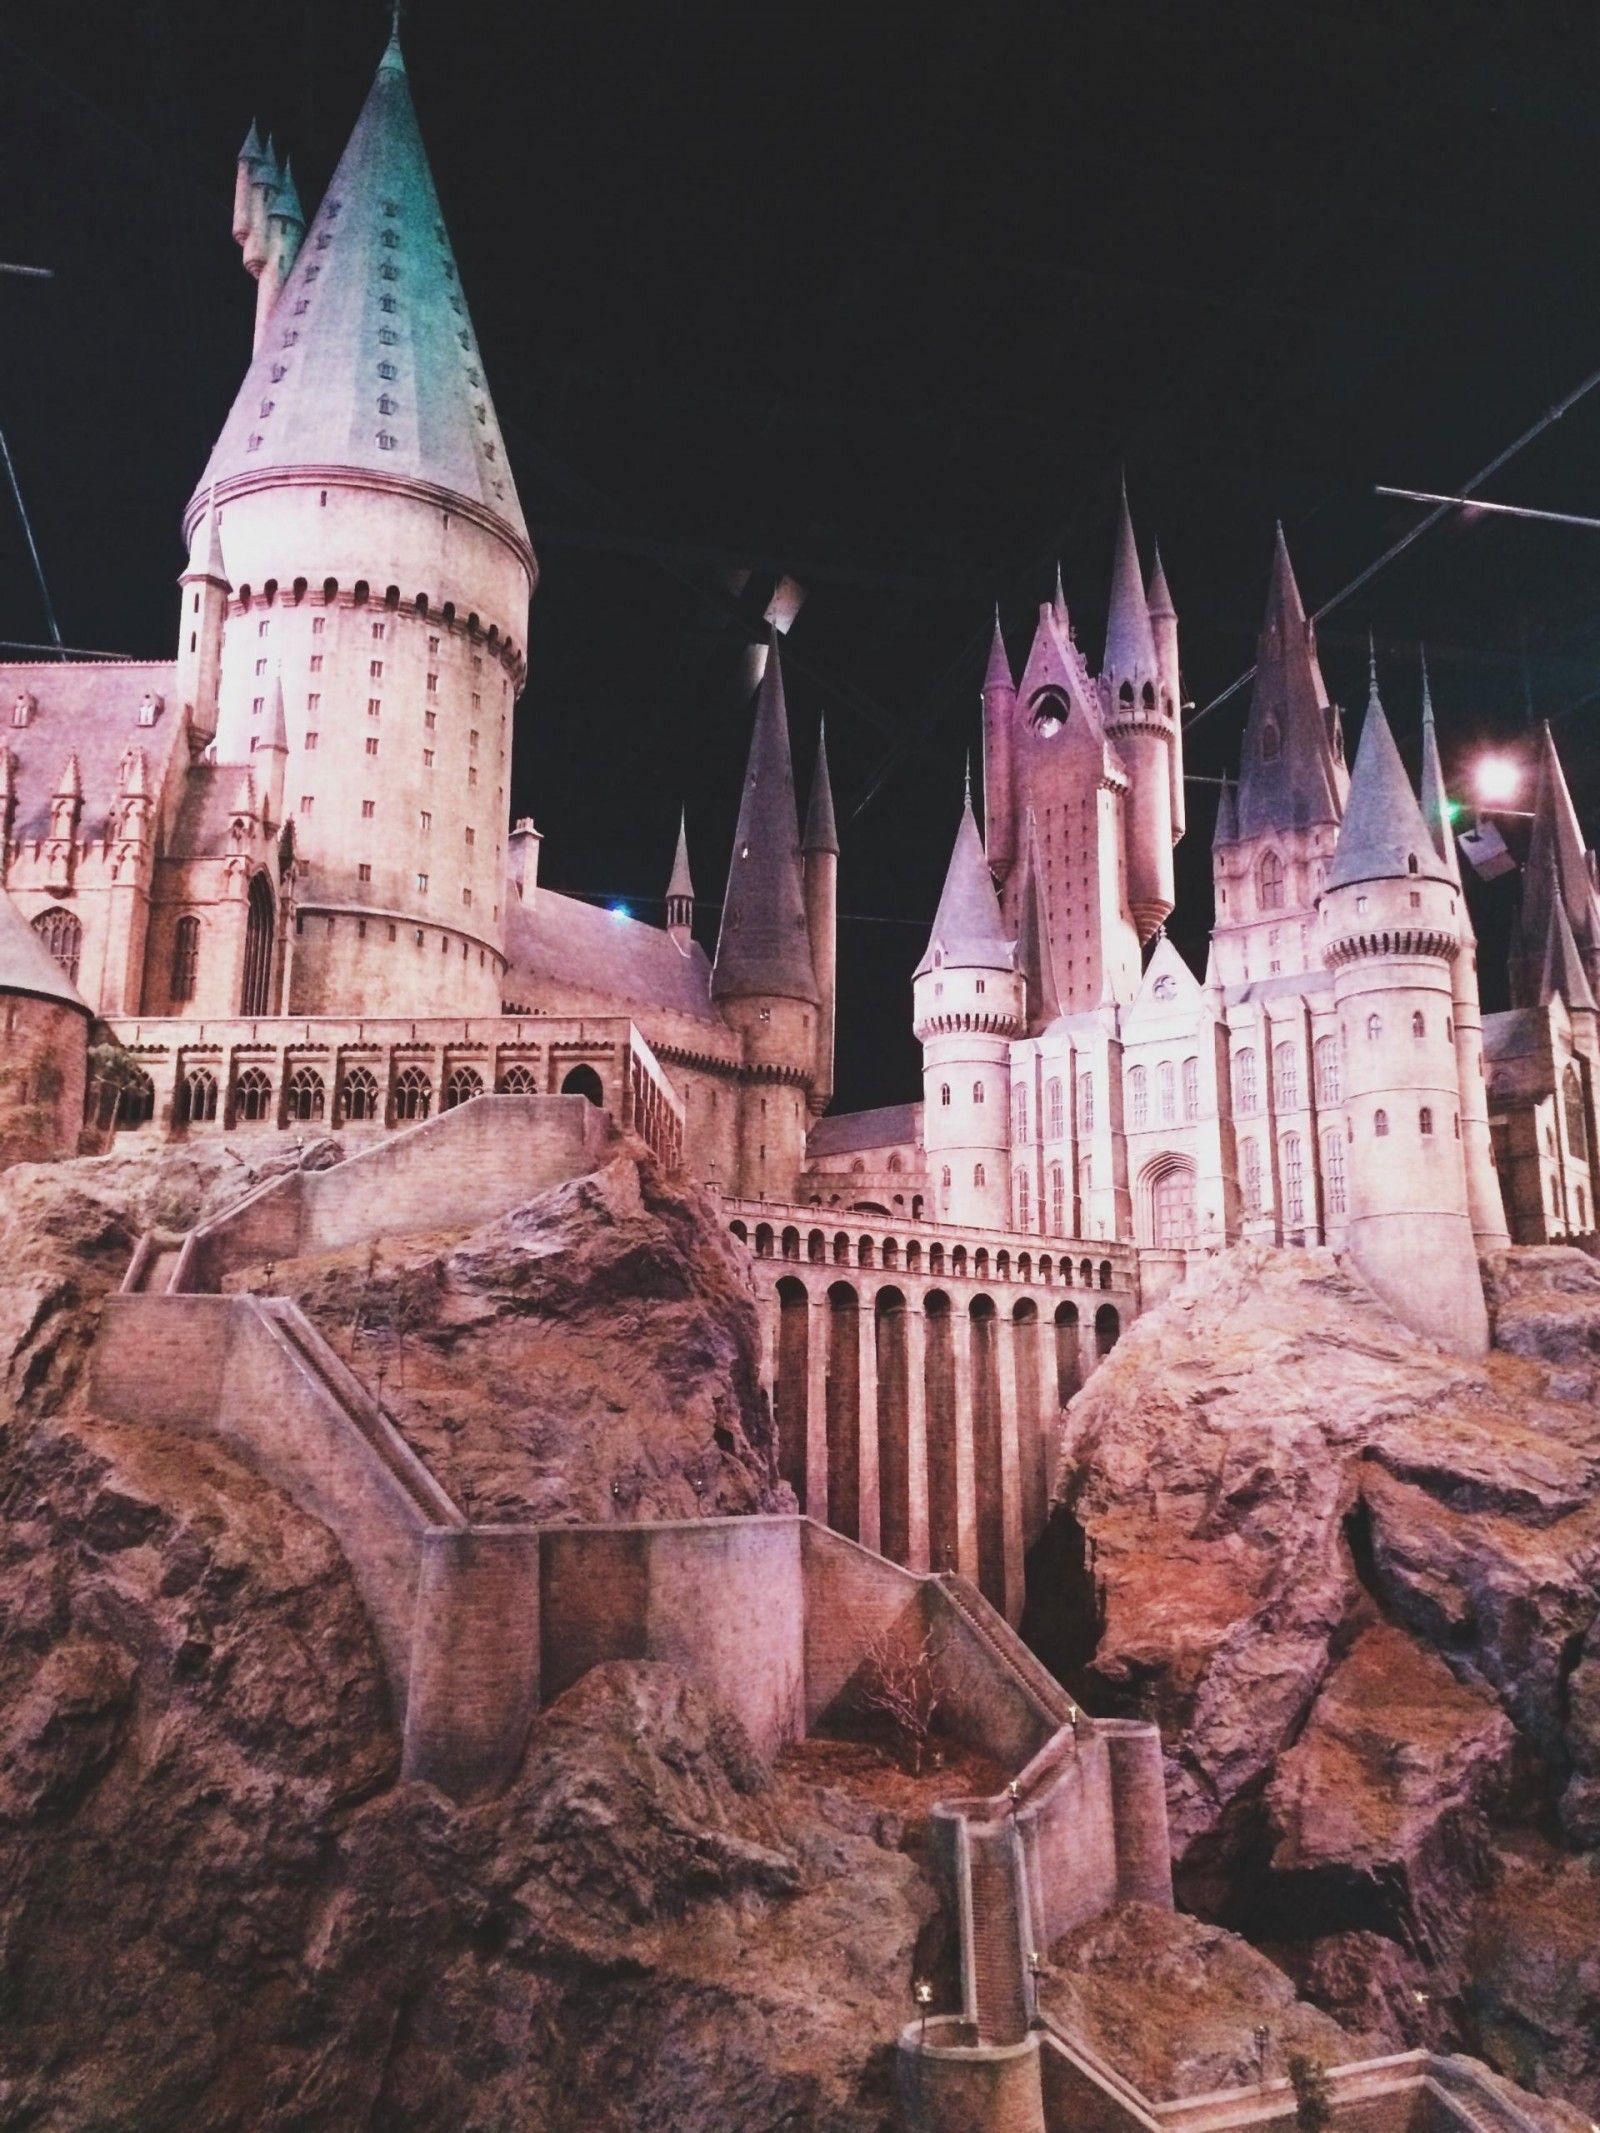 Harry Potter Wb Studio Tour  Hogwarts - Hpmcq